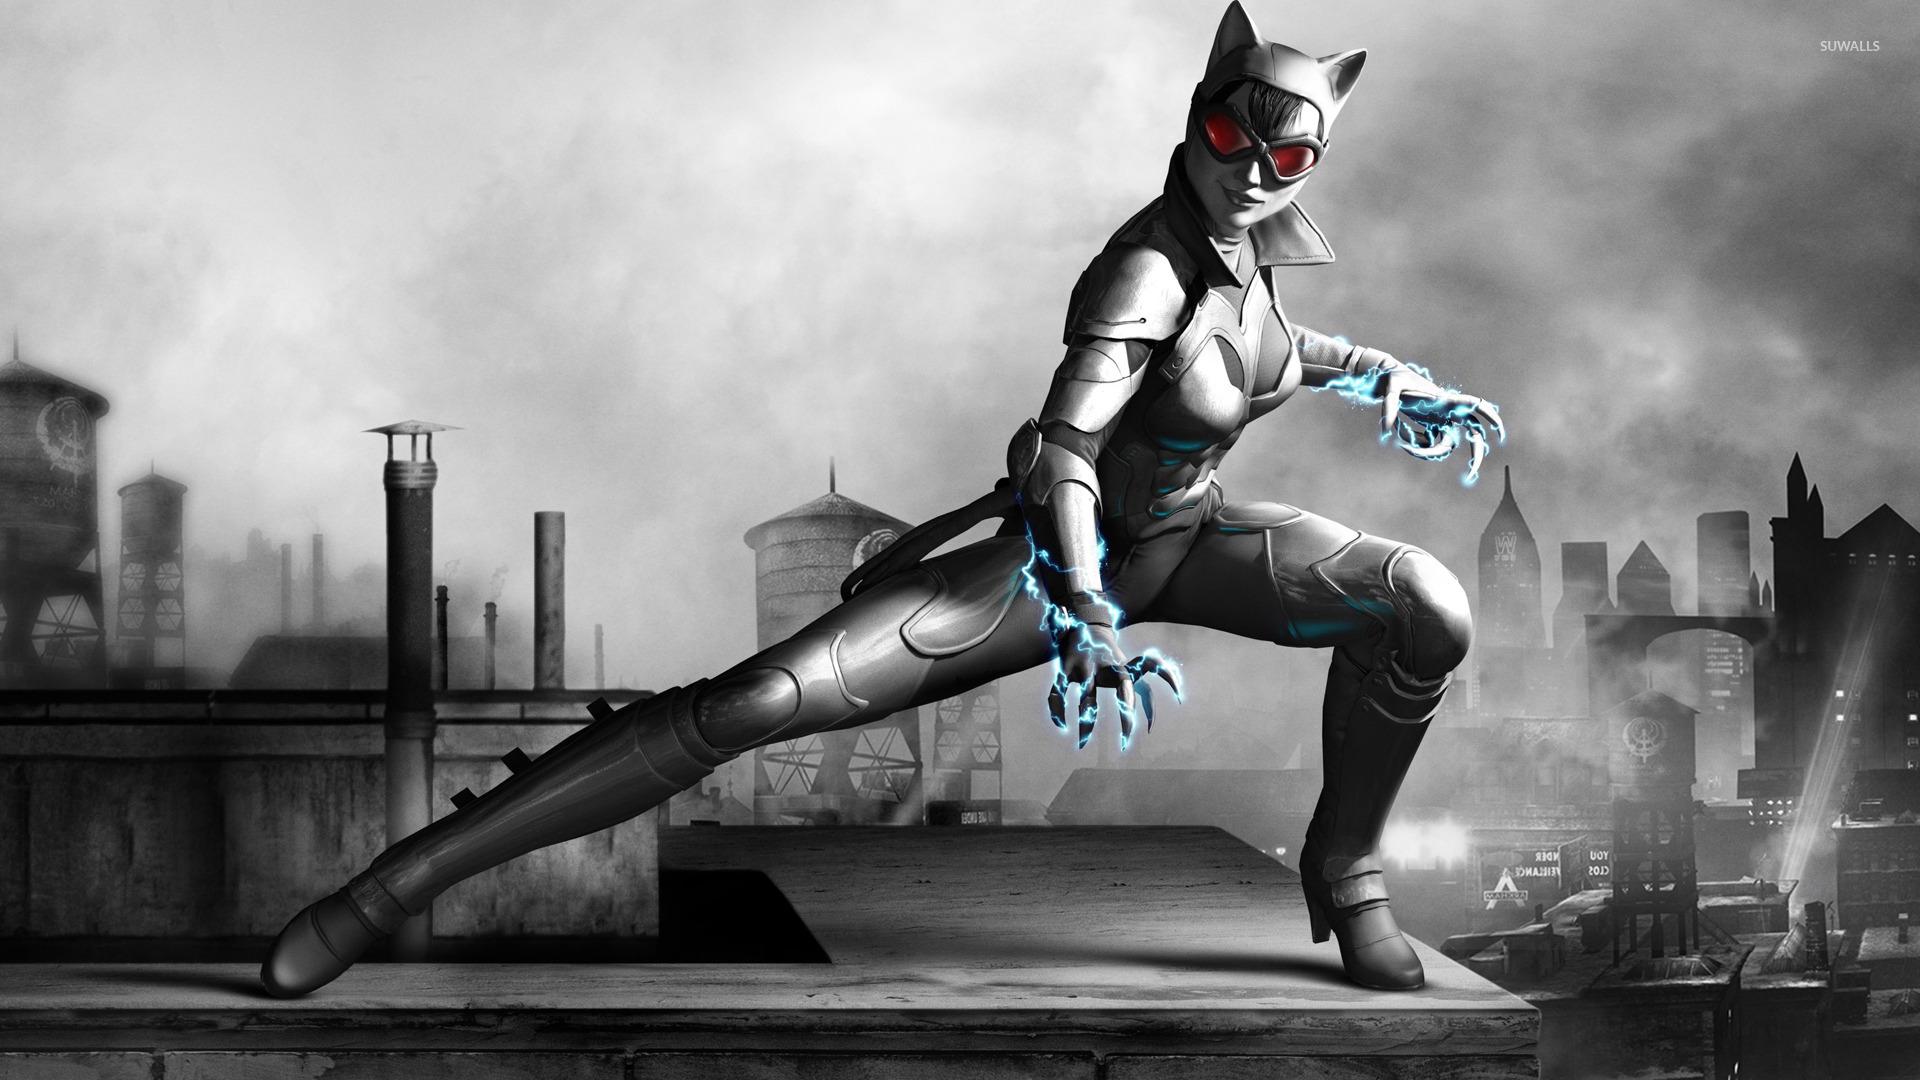 Catwoman Batman Arkham City Wallpaper Game Wallpapers 44494